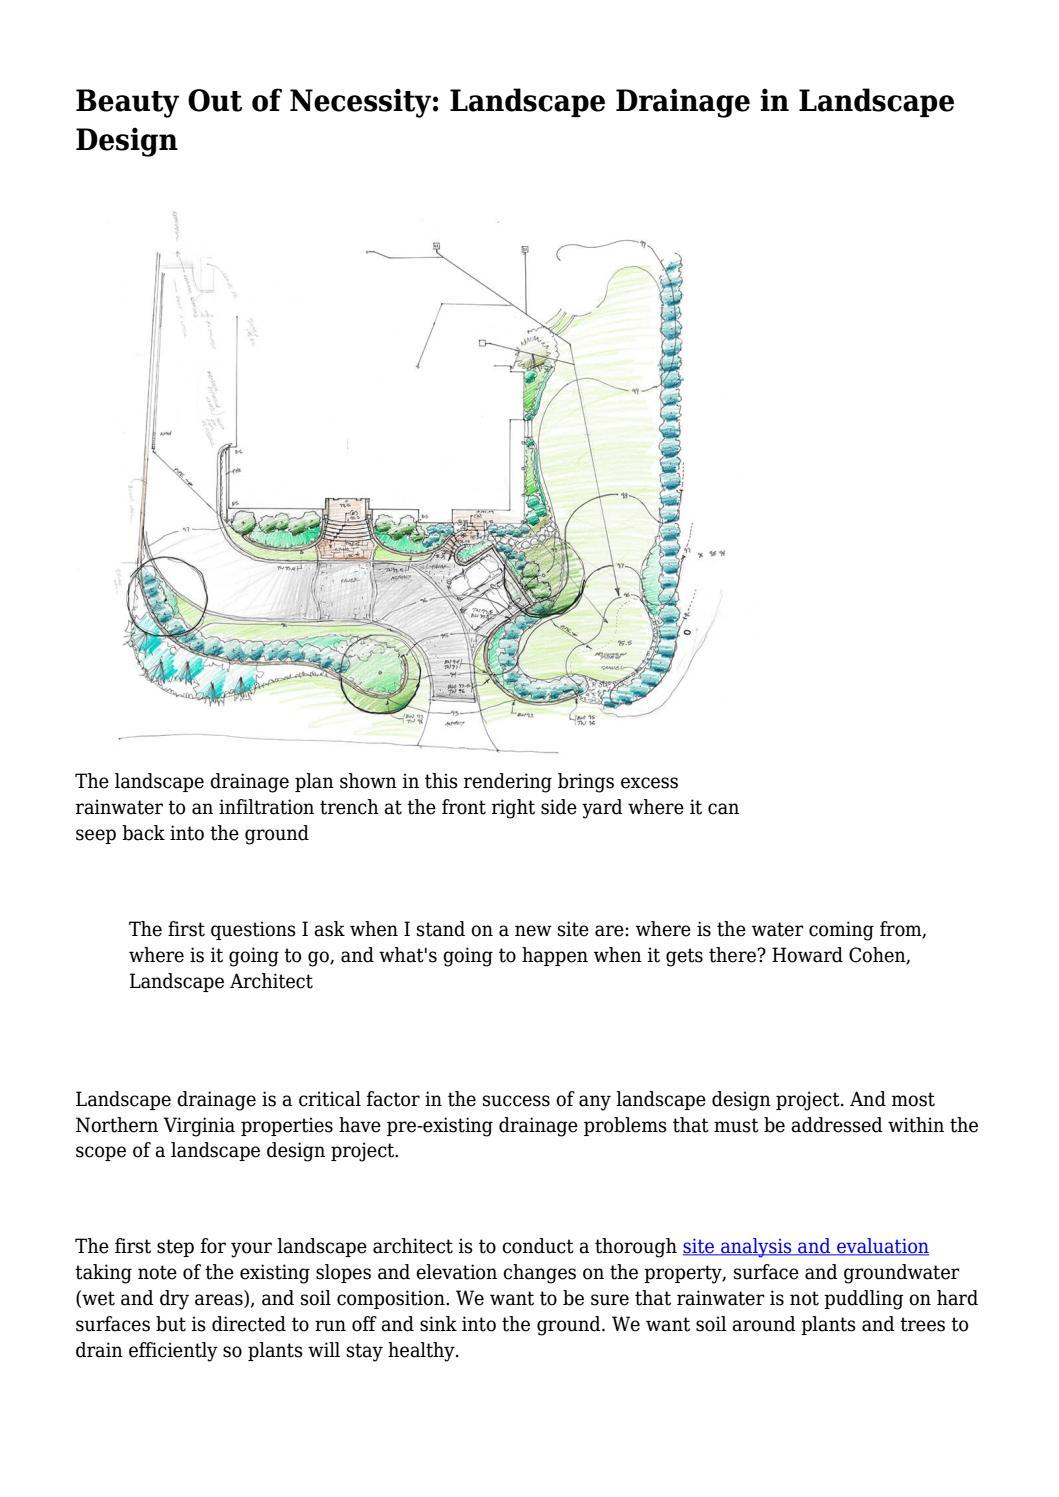 Beauty Out Of Necessity Landscape Drainage In Landscape Design By Davisjohnson236 Issuu